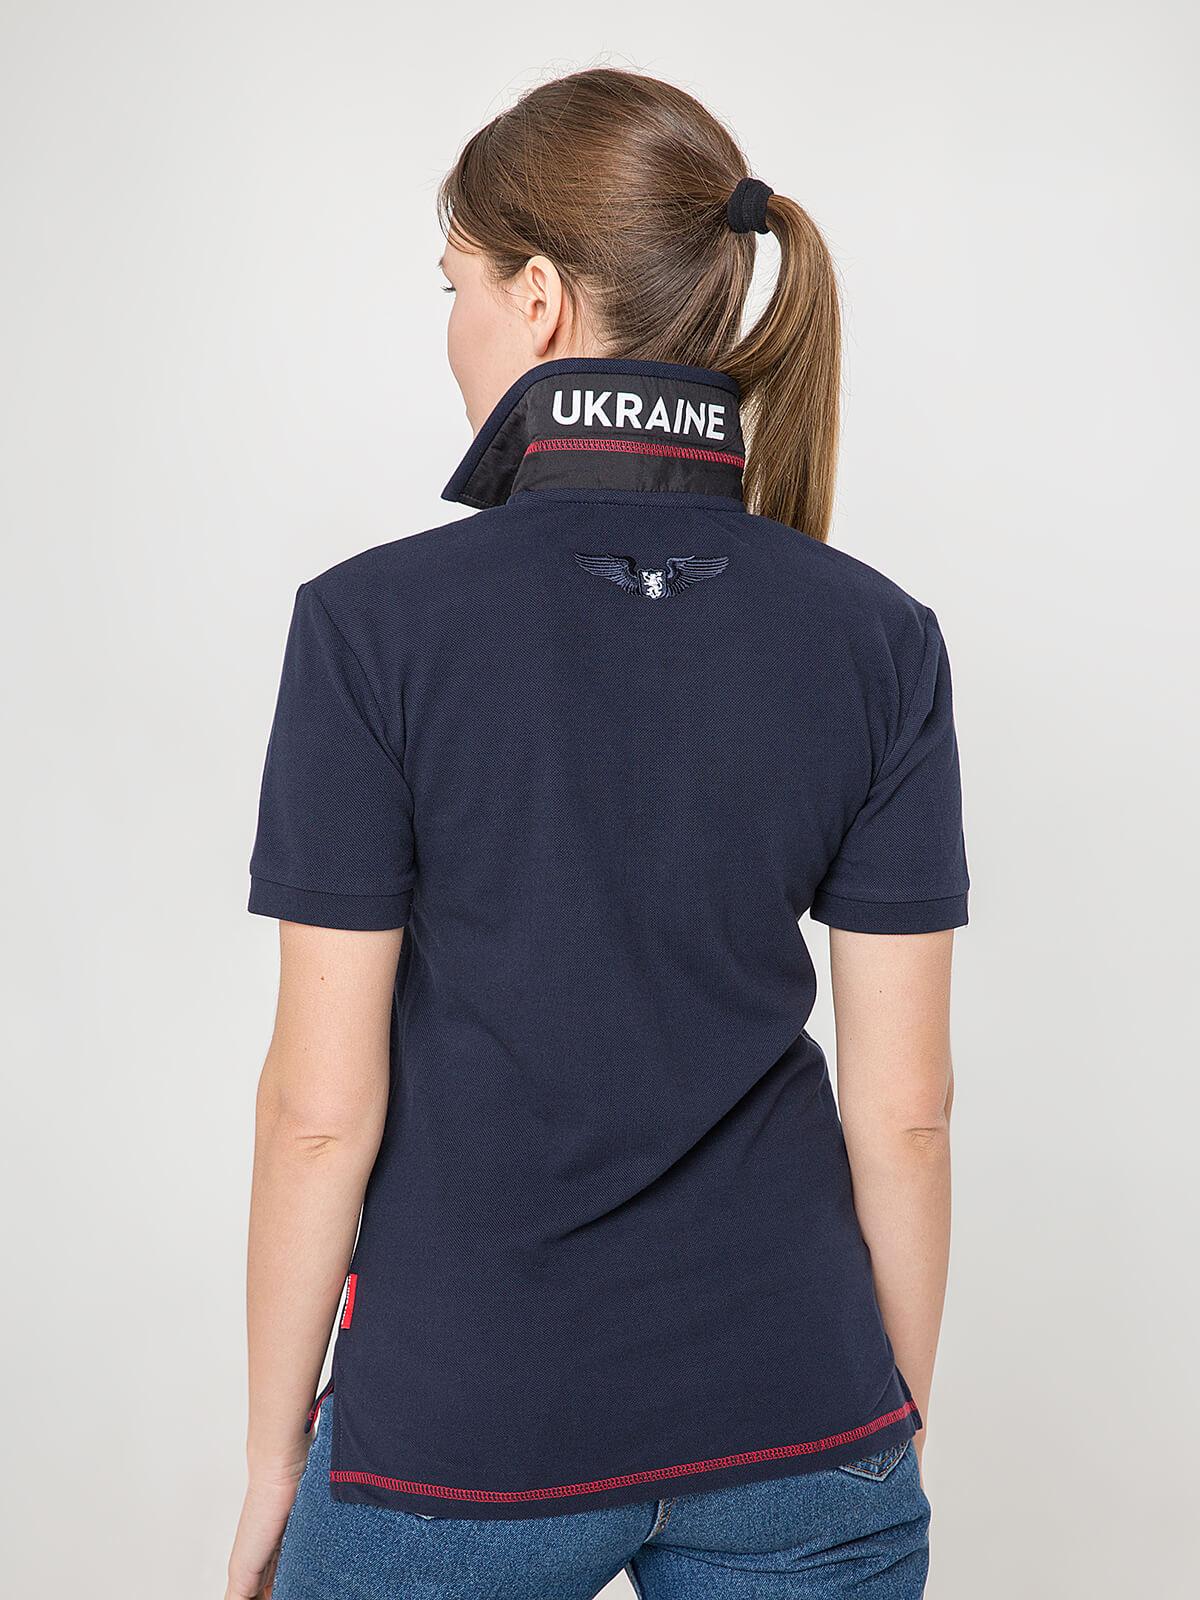 Women's Polo Shirt Wings. Color dark blue.  Pique fabric: 100% cotton.